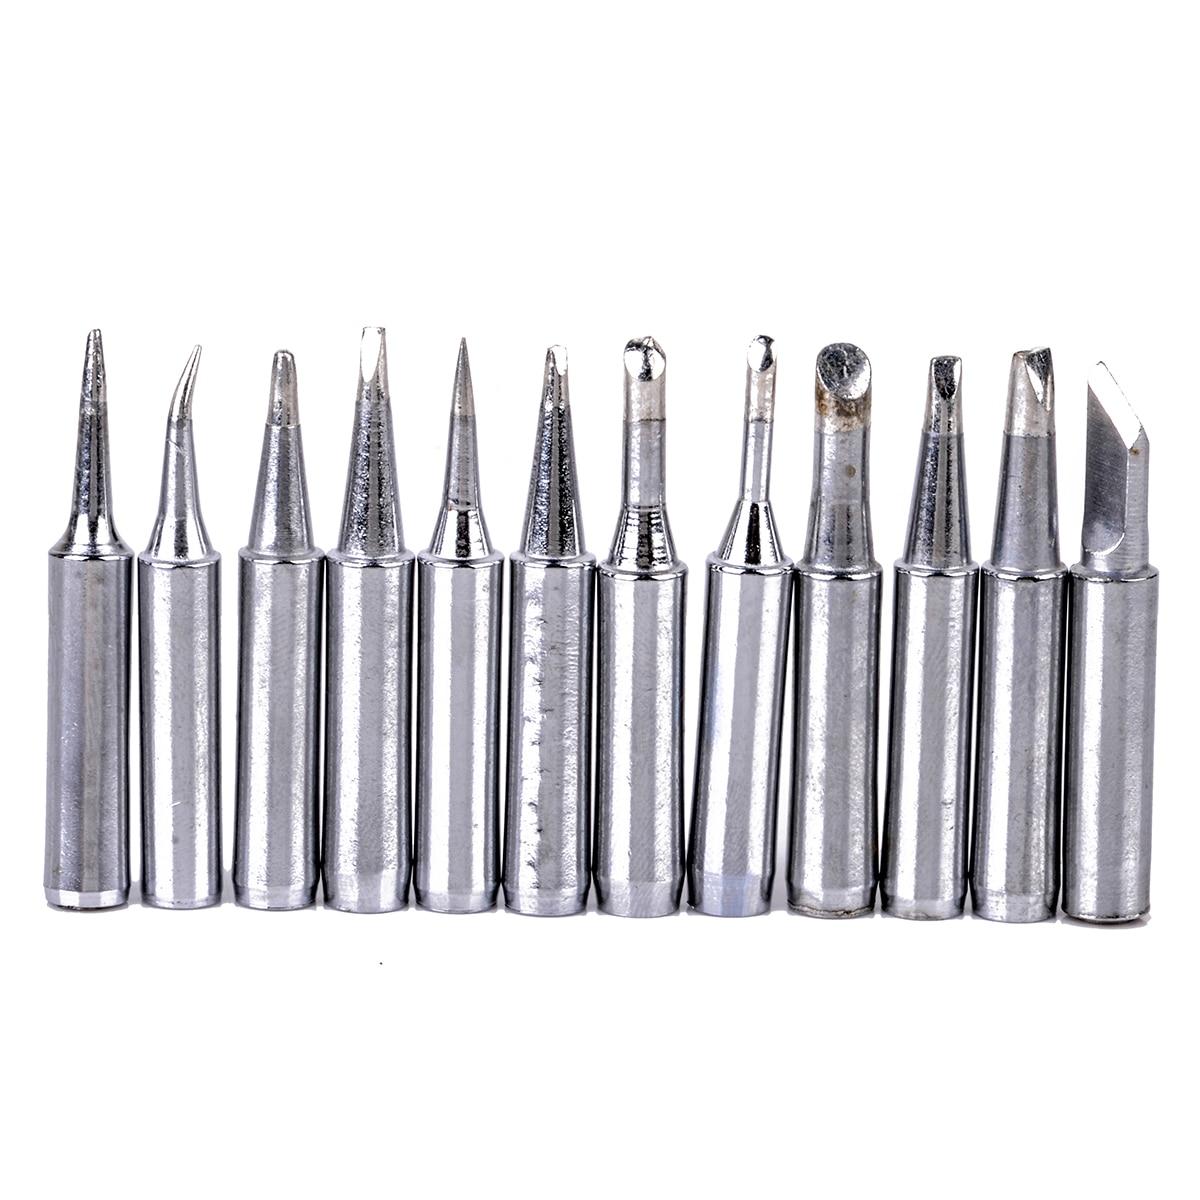 12pcs Soldering TIP Iron Tips 900M-T for Hakko936//937//928 Soldering Station tool